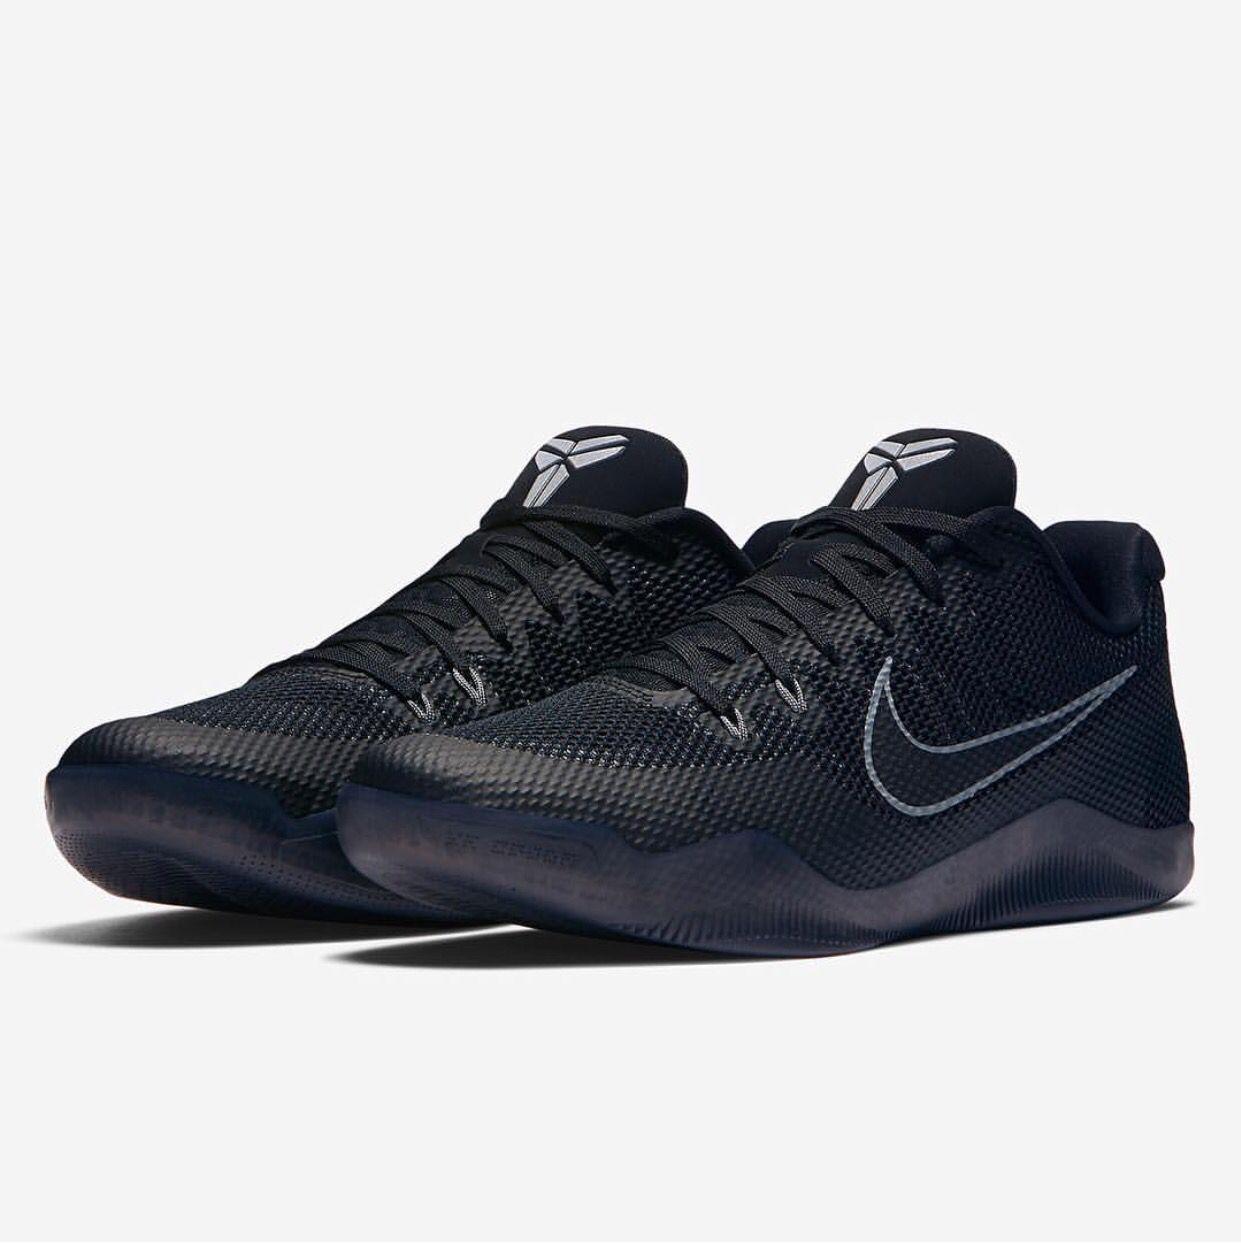 uk availability d97d1 6060d Nike Kobe 11 - Black Mamba Colorway